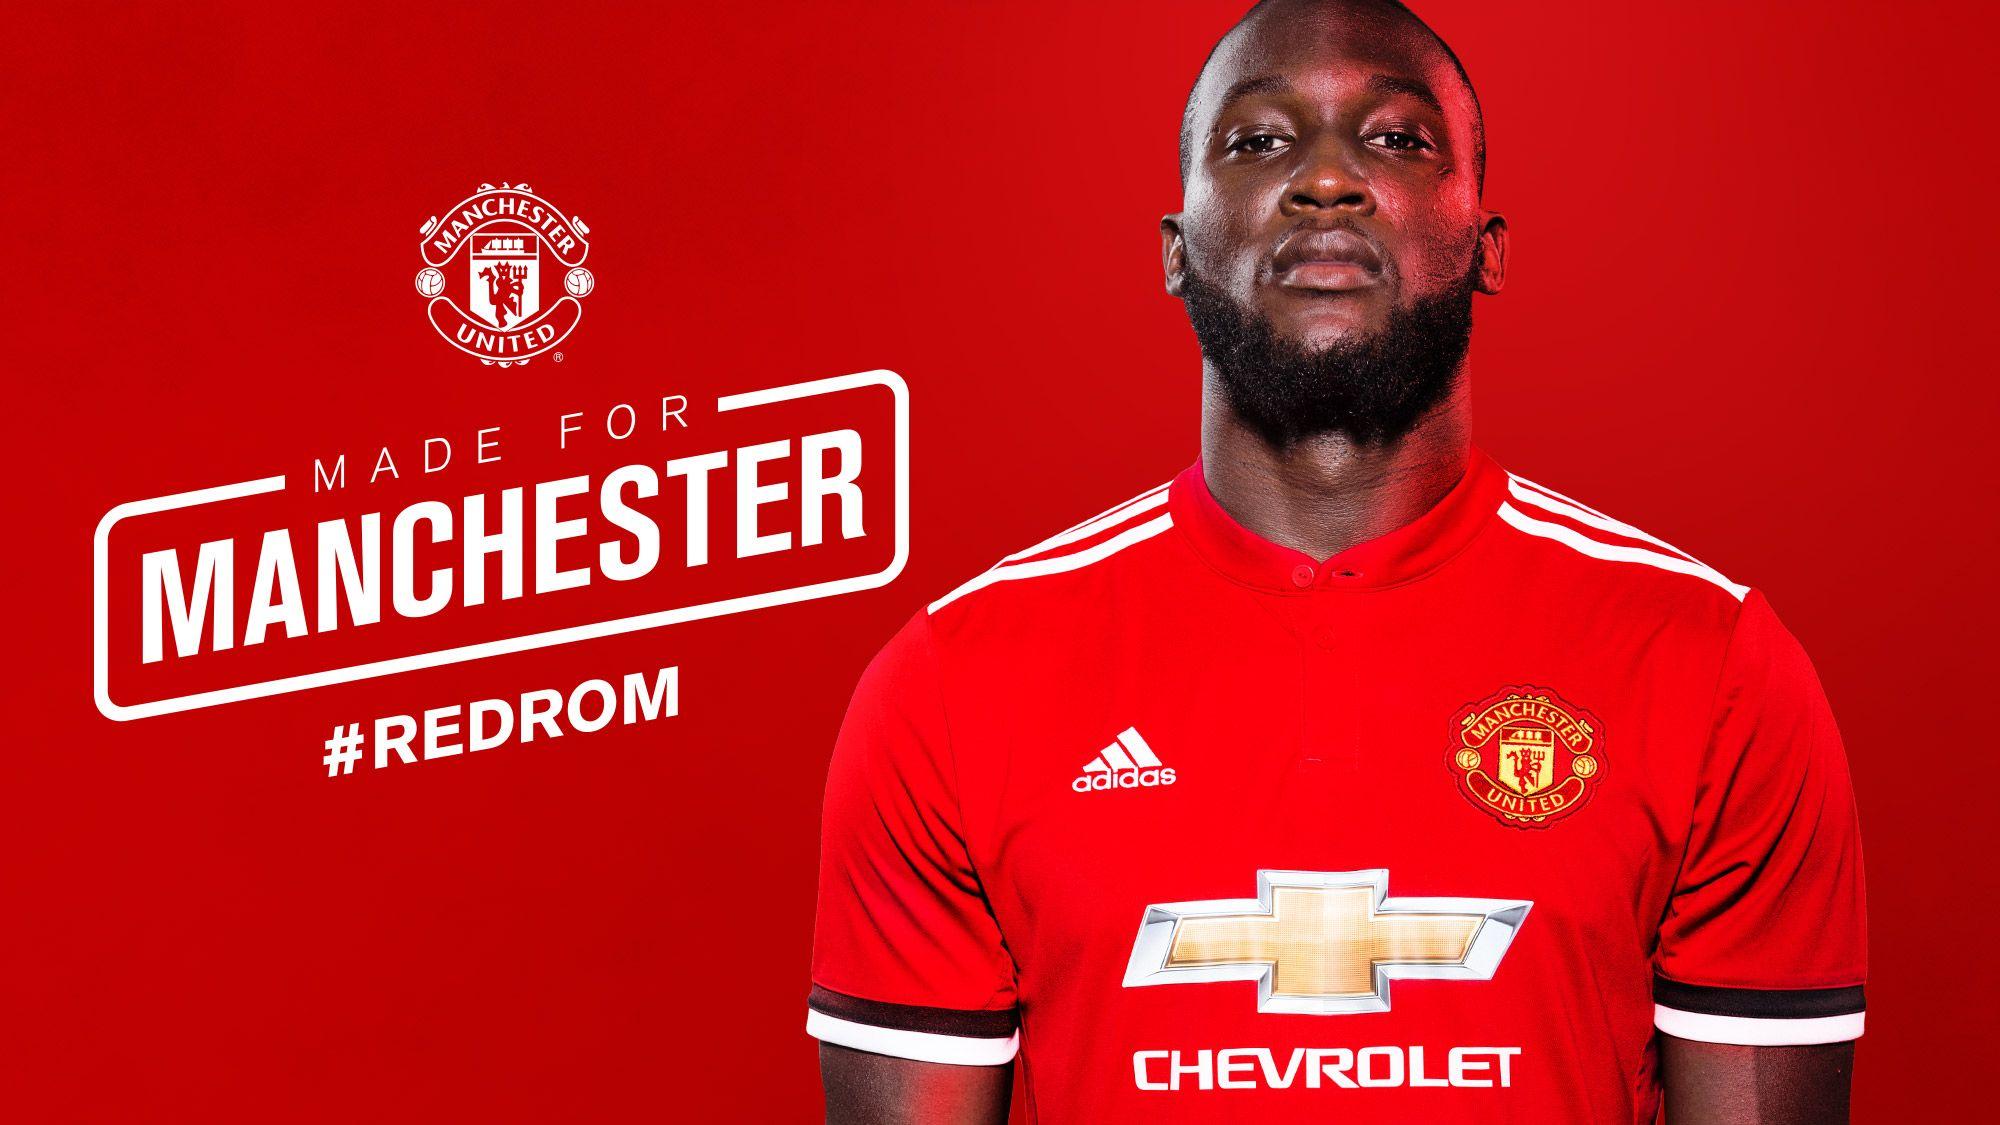 Manchester United Confirm Lukaku Signing Redrom Romelu Lukaku Manchester United Manchester United Football Club